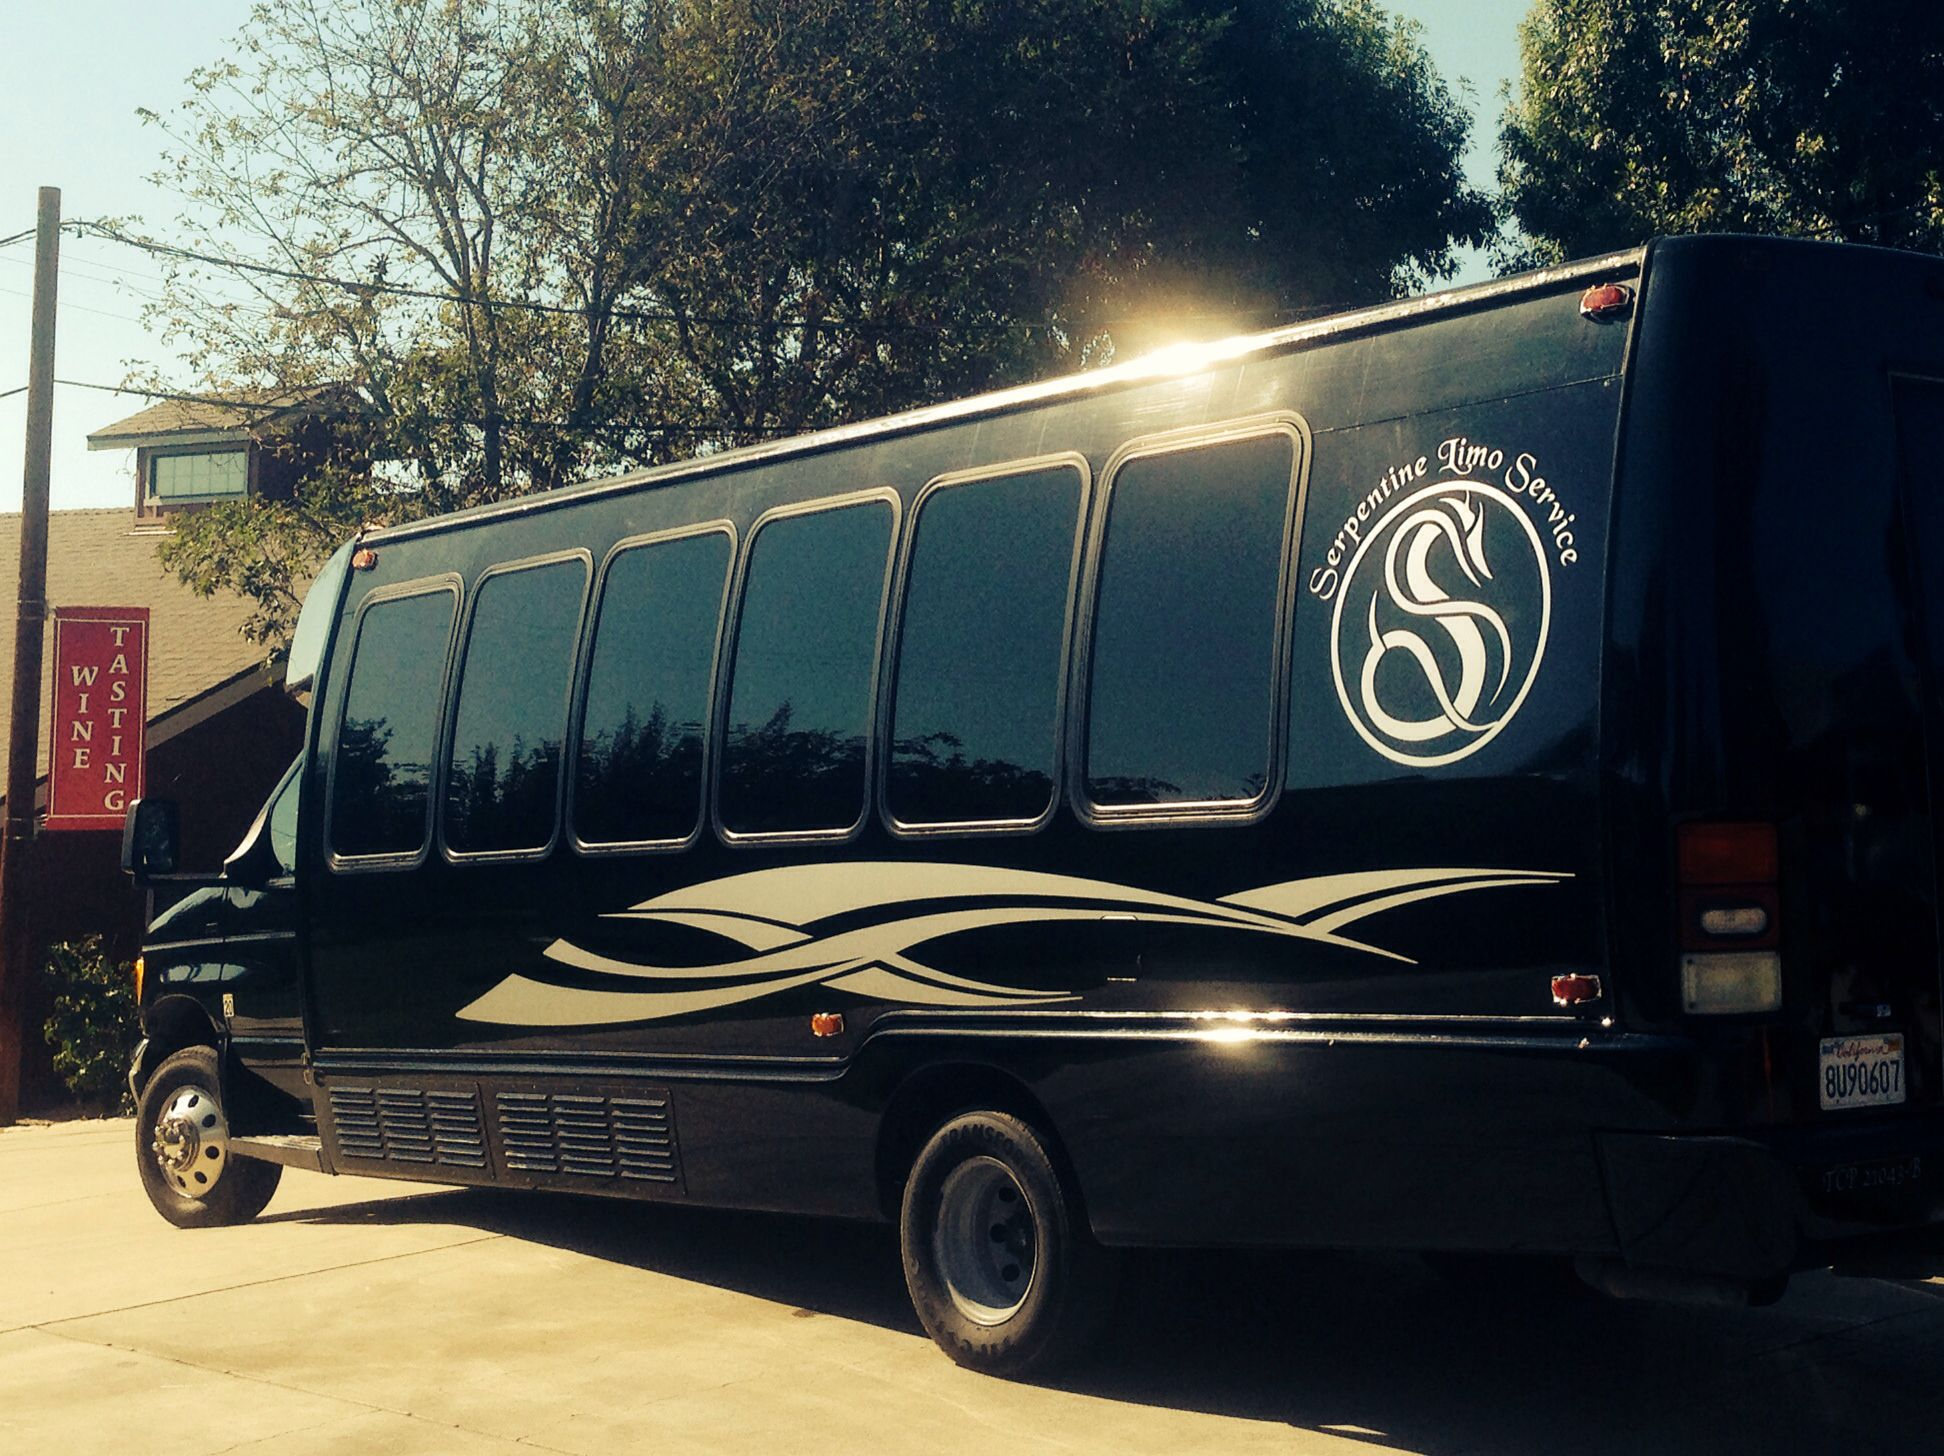 Cheap 20 passenger concert birthday bachelorette party bus